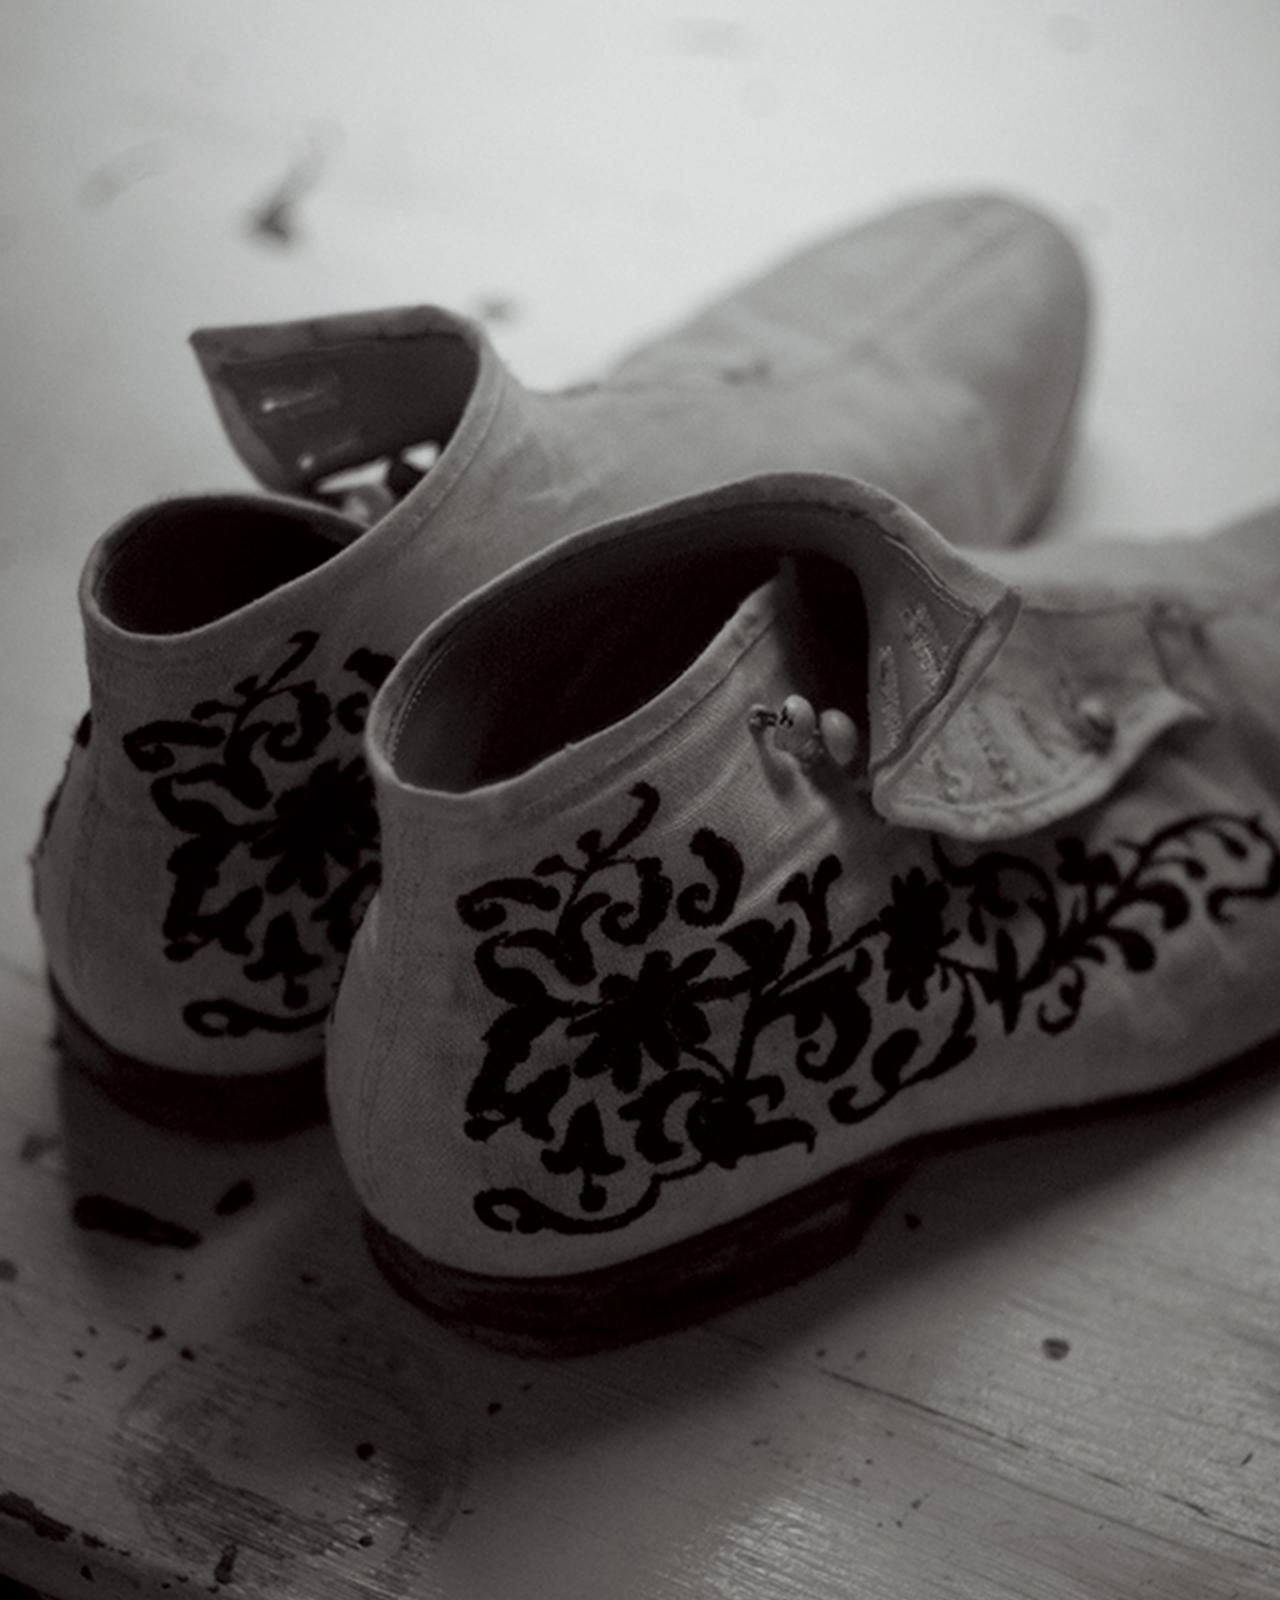 Images : 6番目の画像 - 「画家ヒグチユウコの 世界をつくるもの」のアルバム - T JAPAN:The New York Times Style Magazine 公式サイト